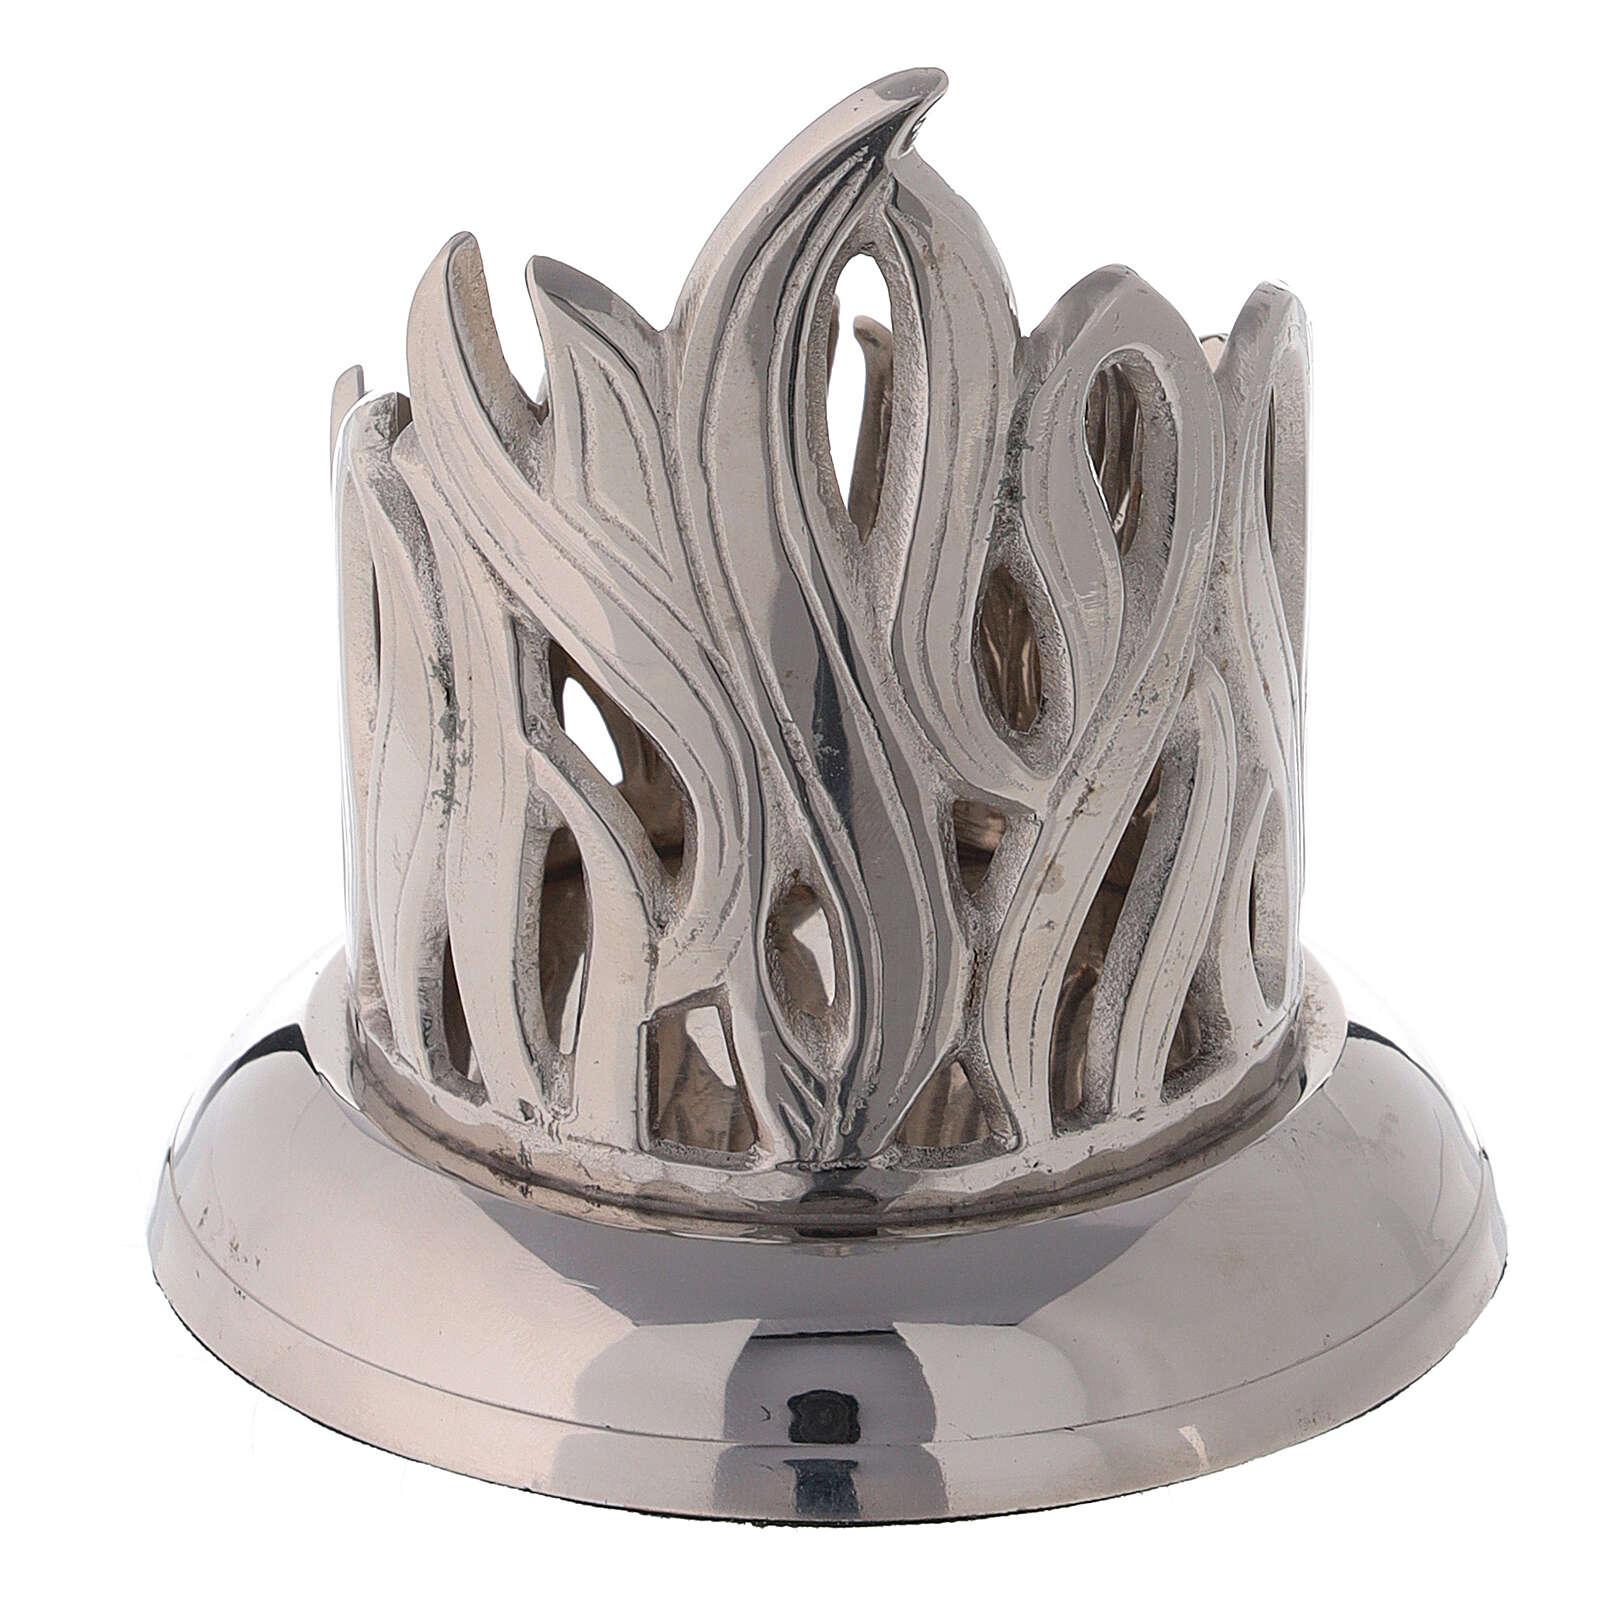 Bougeoir flamme laiton nickelé diamètre 6 cm 4